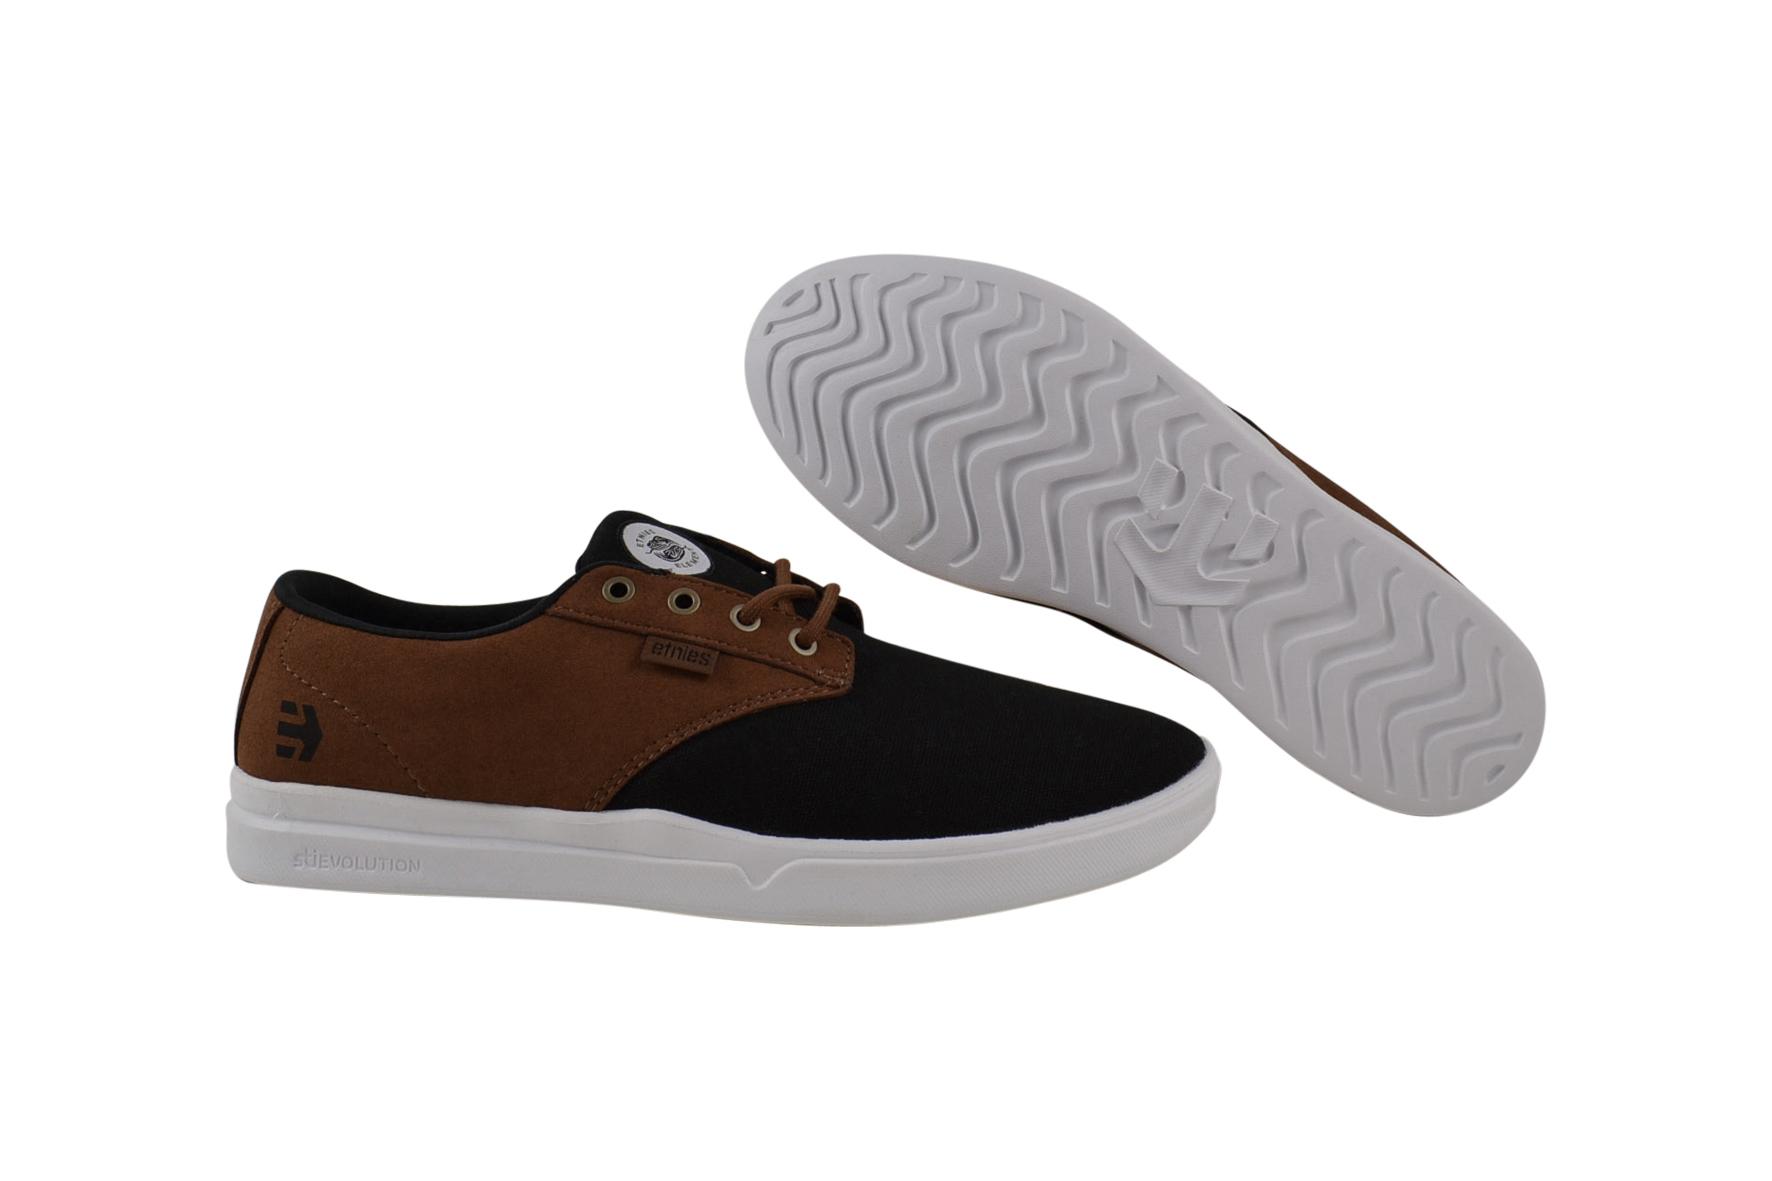 Detalles de Etnies Jameson Sc X Element BlackMarrón Zapatillas Zapatos Negro Braun